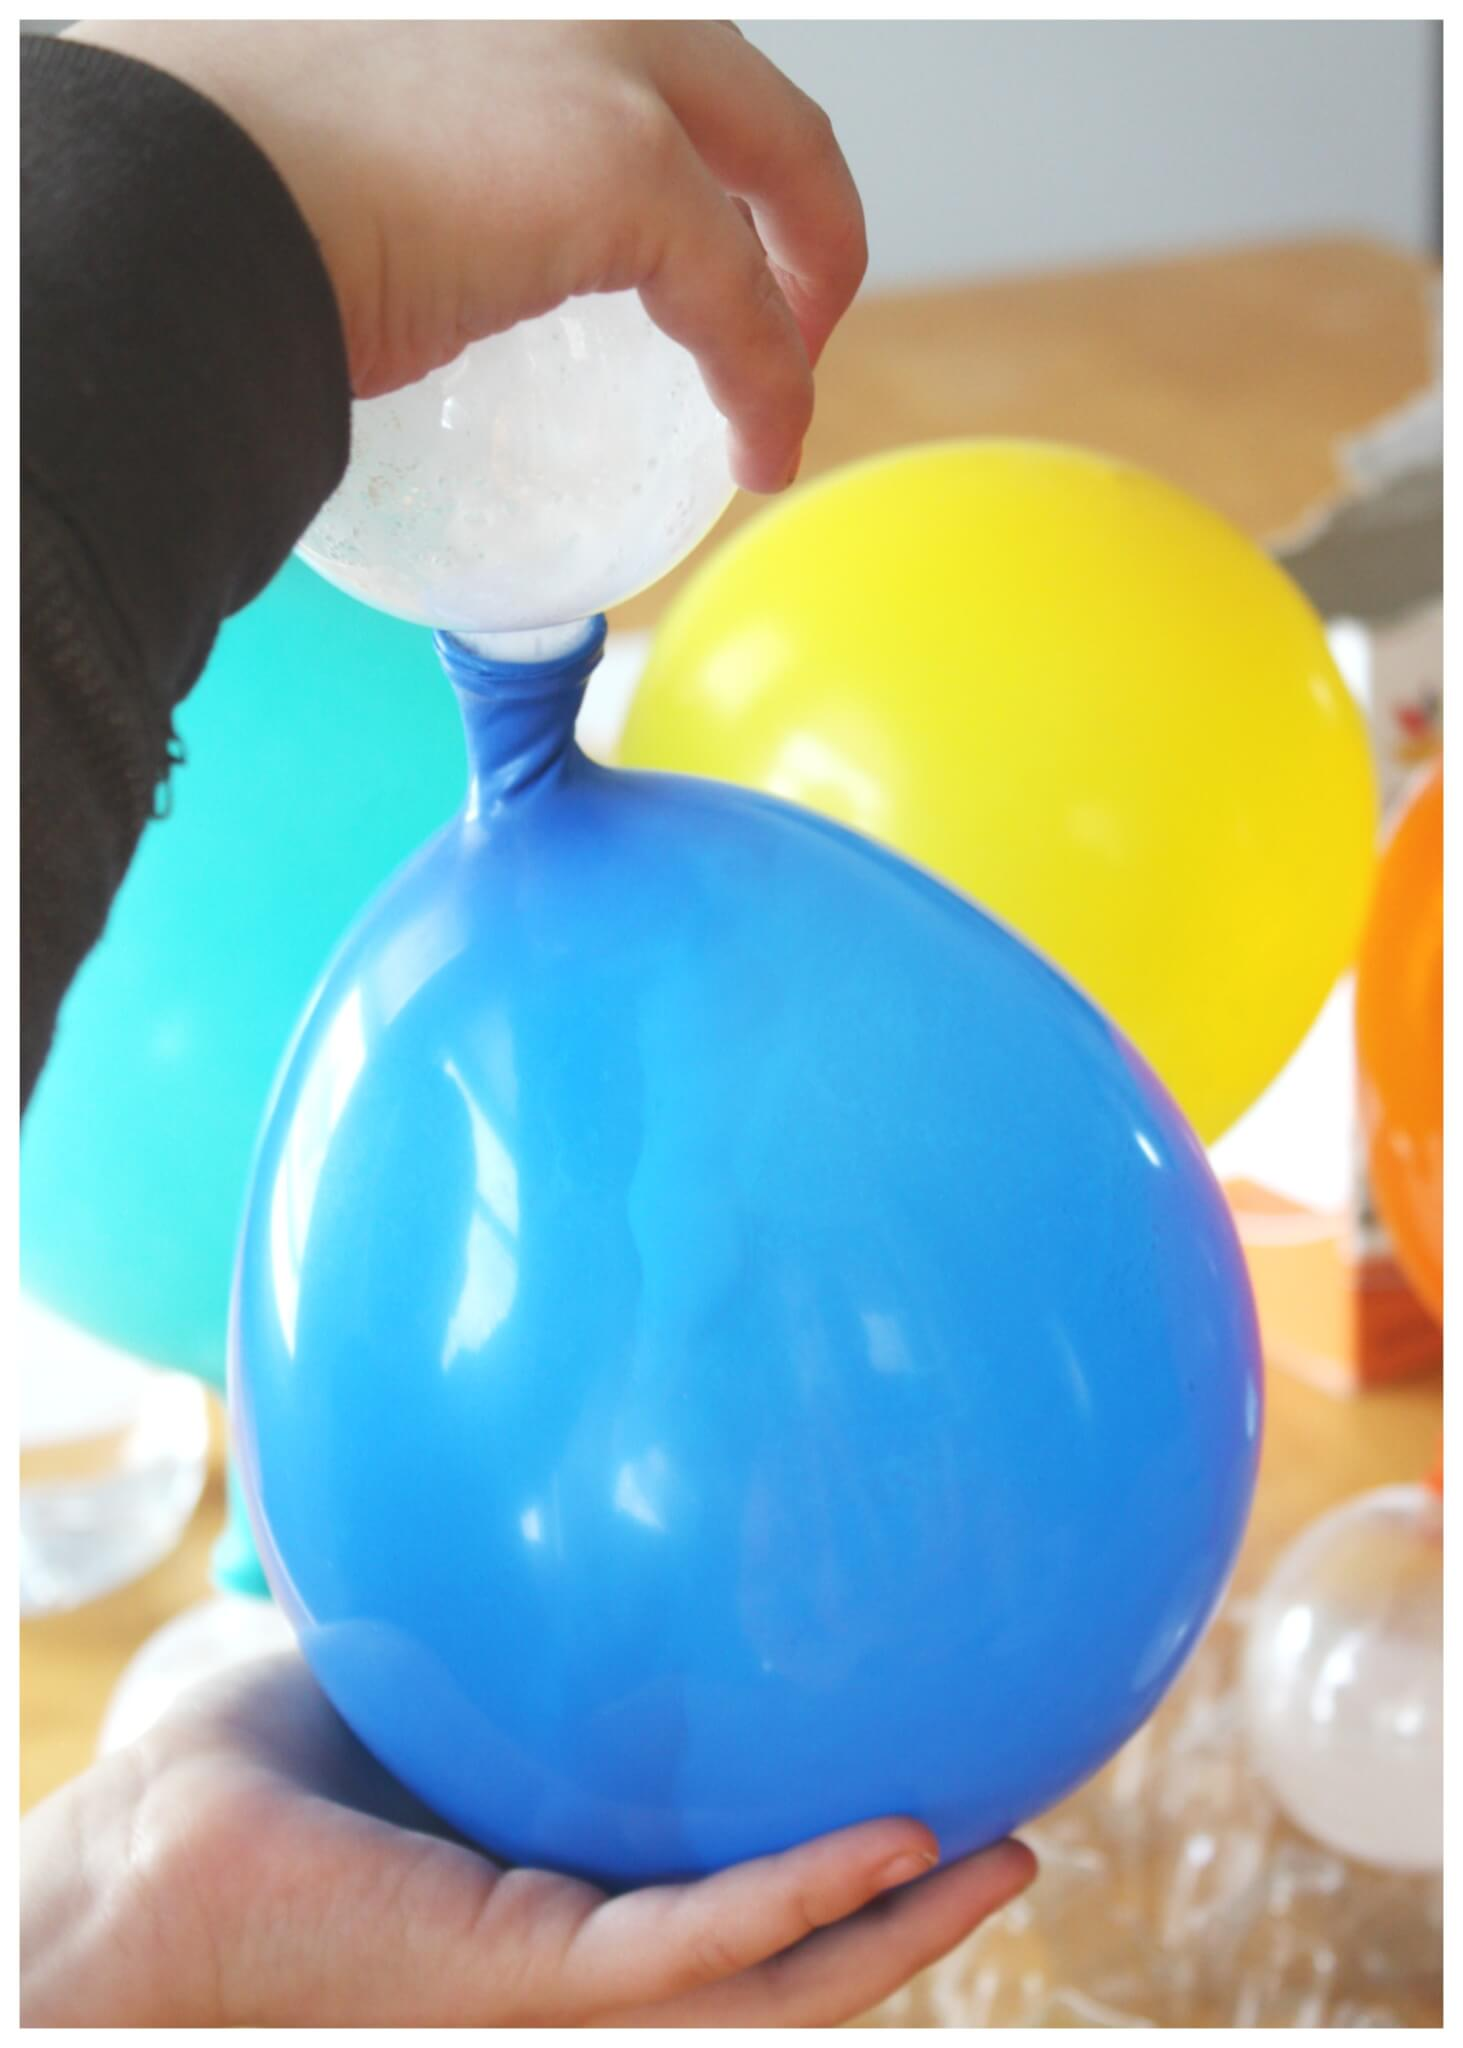 Balloon Baking Soda Vinegar Experiment Kids